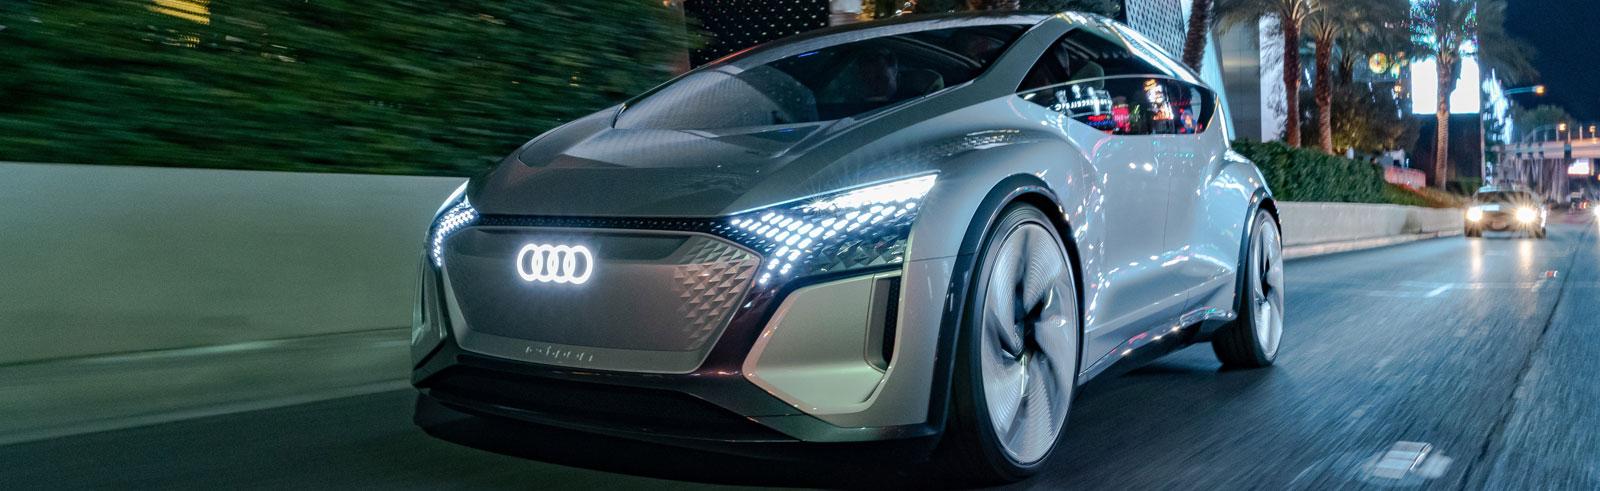 Audi AI:ME concept, Q4 e-tron concept and E-Tron Sportback are on display at CES 2020